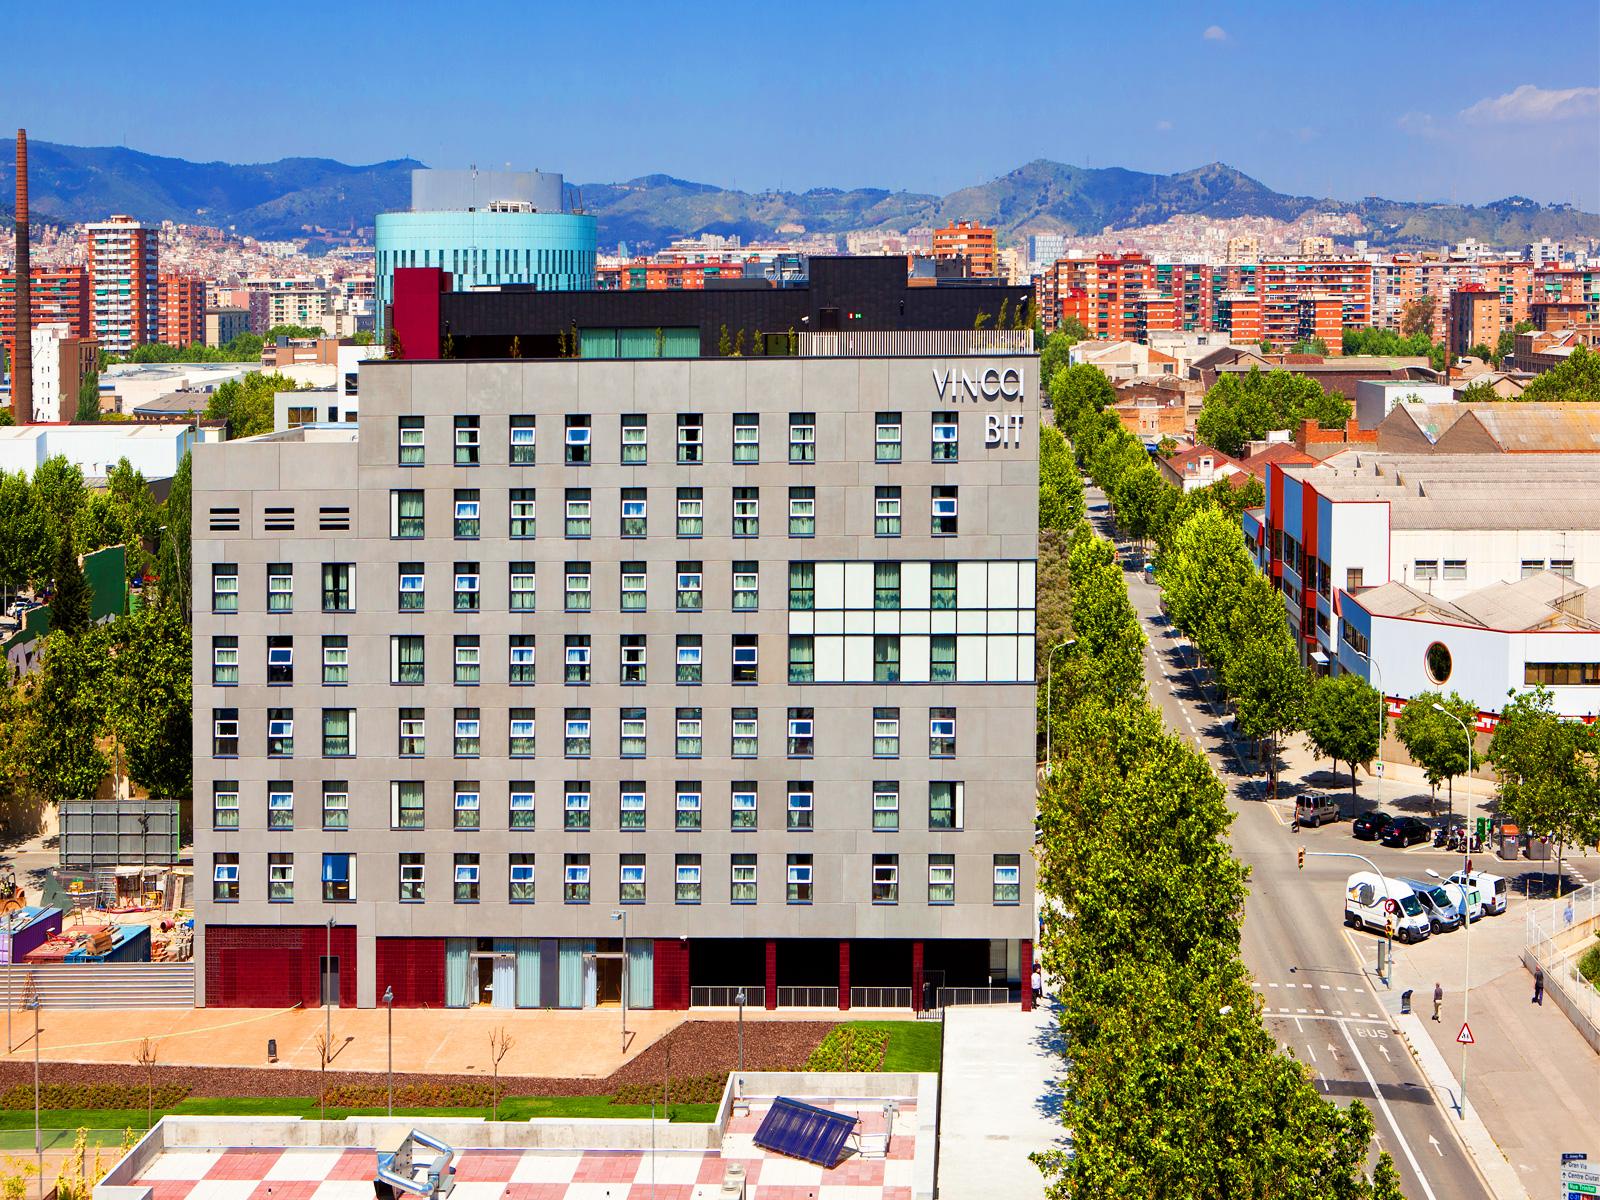 Hotel barcelona bit vincci hotels - Hotel vincci barcelona ...